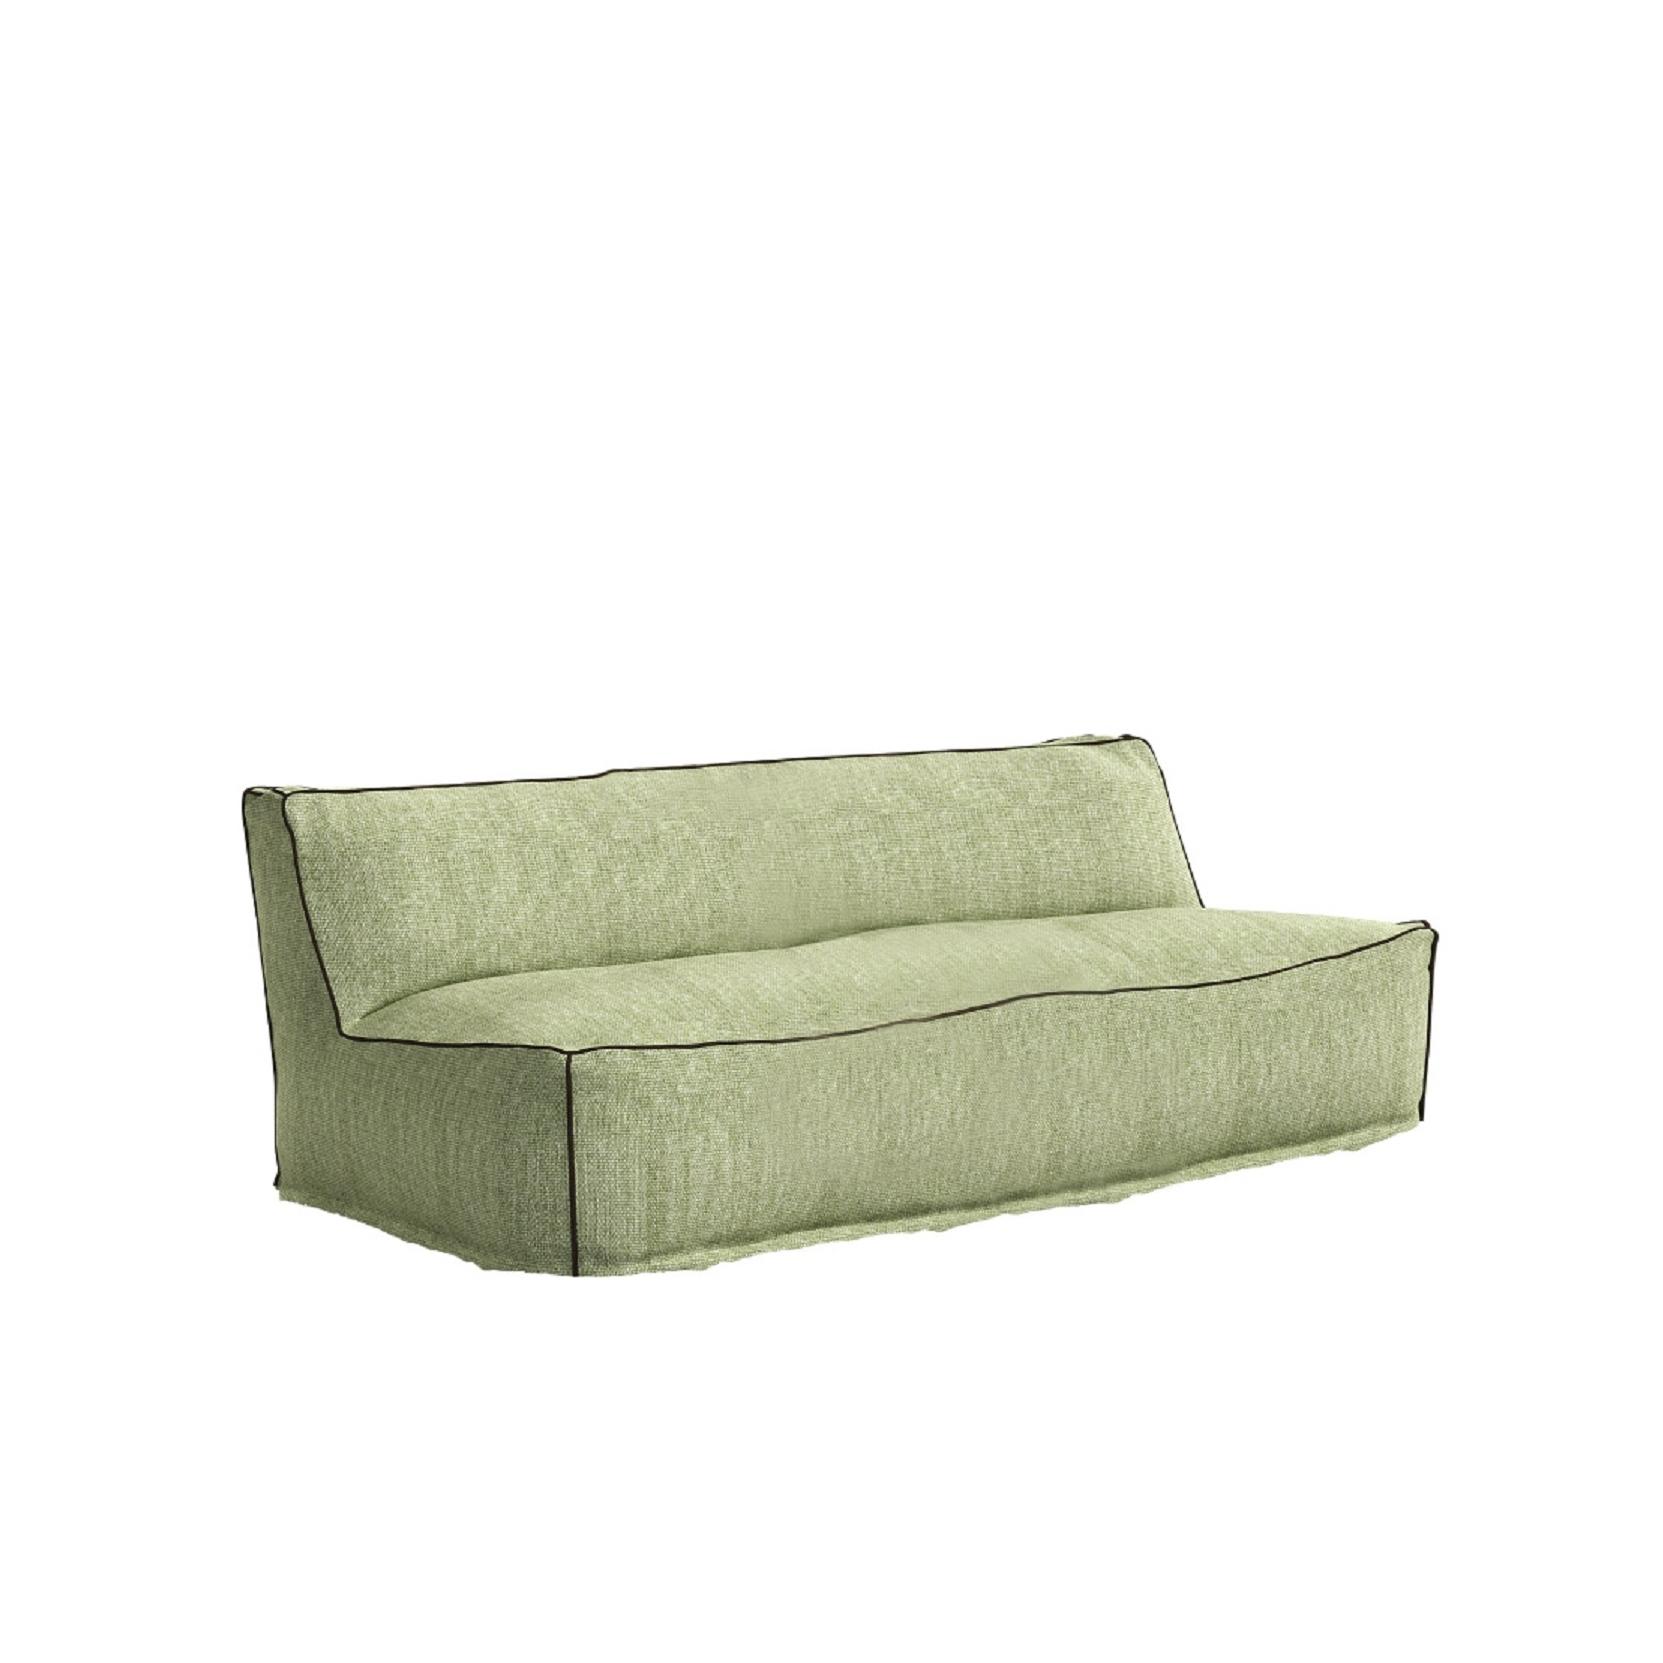 Atmosphera soft divano due posti tattahome for Divano due posti